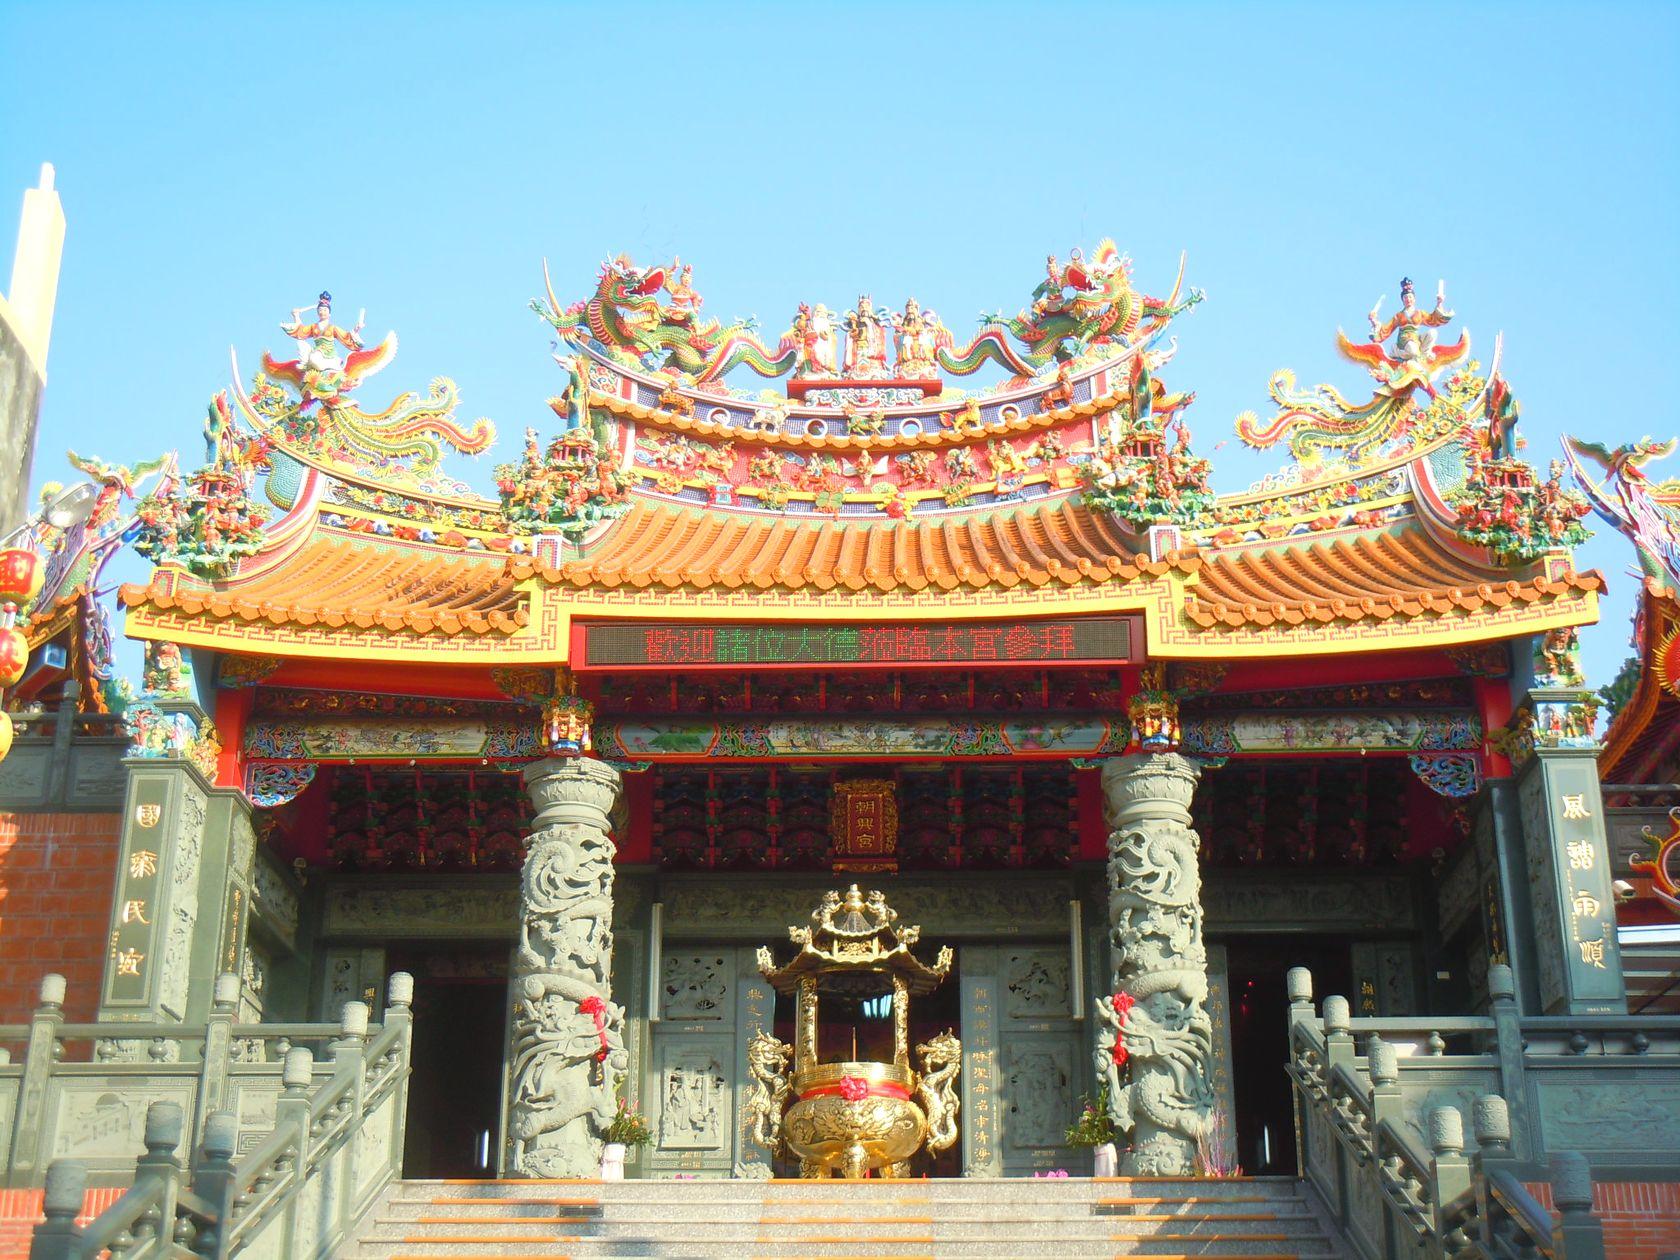 File:沙鹿媽祖廟.JPG - 維基百科,自由的百科全書